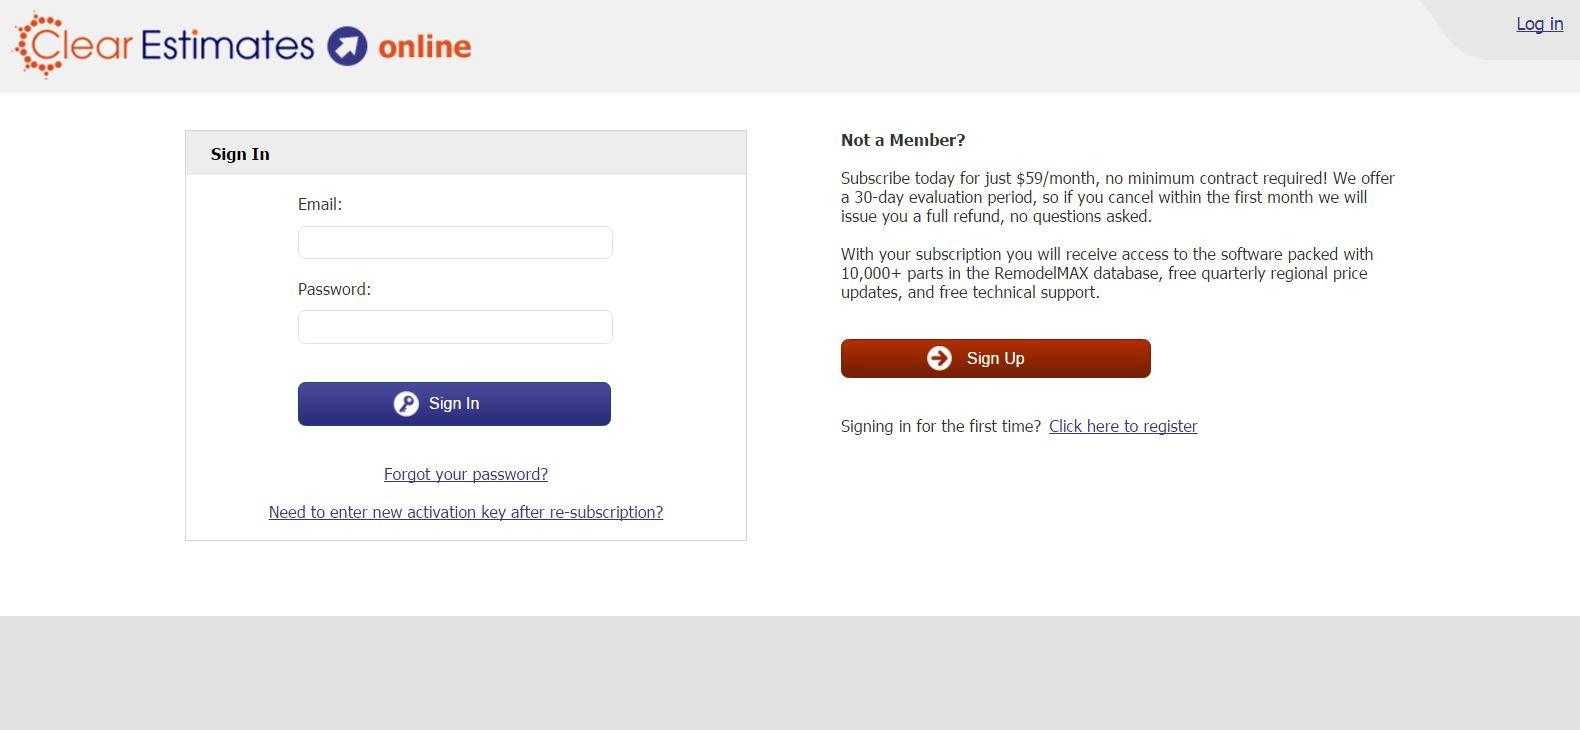 Clear Estimates screenshot: Clear Estimates login page